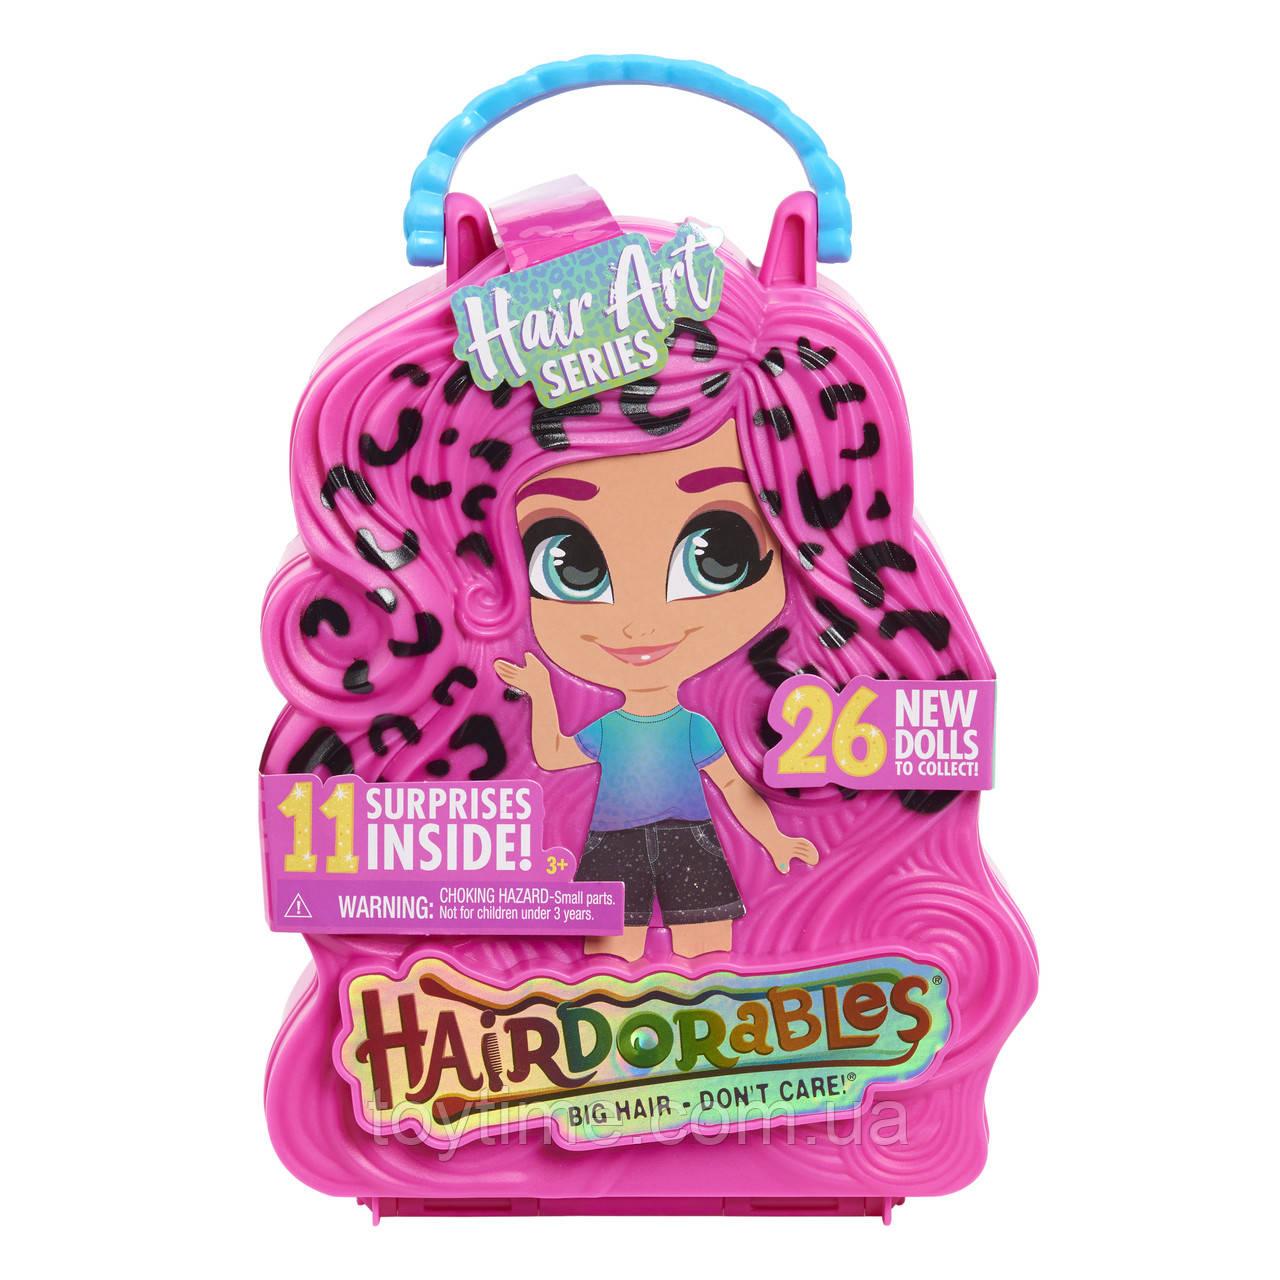 Куколки Хейрдораблес Хеир Арт серия 5 / Hairdorables Collectible Dolls Hair Art Series 5